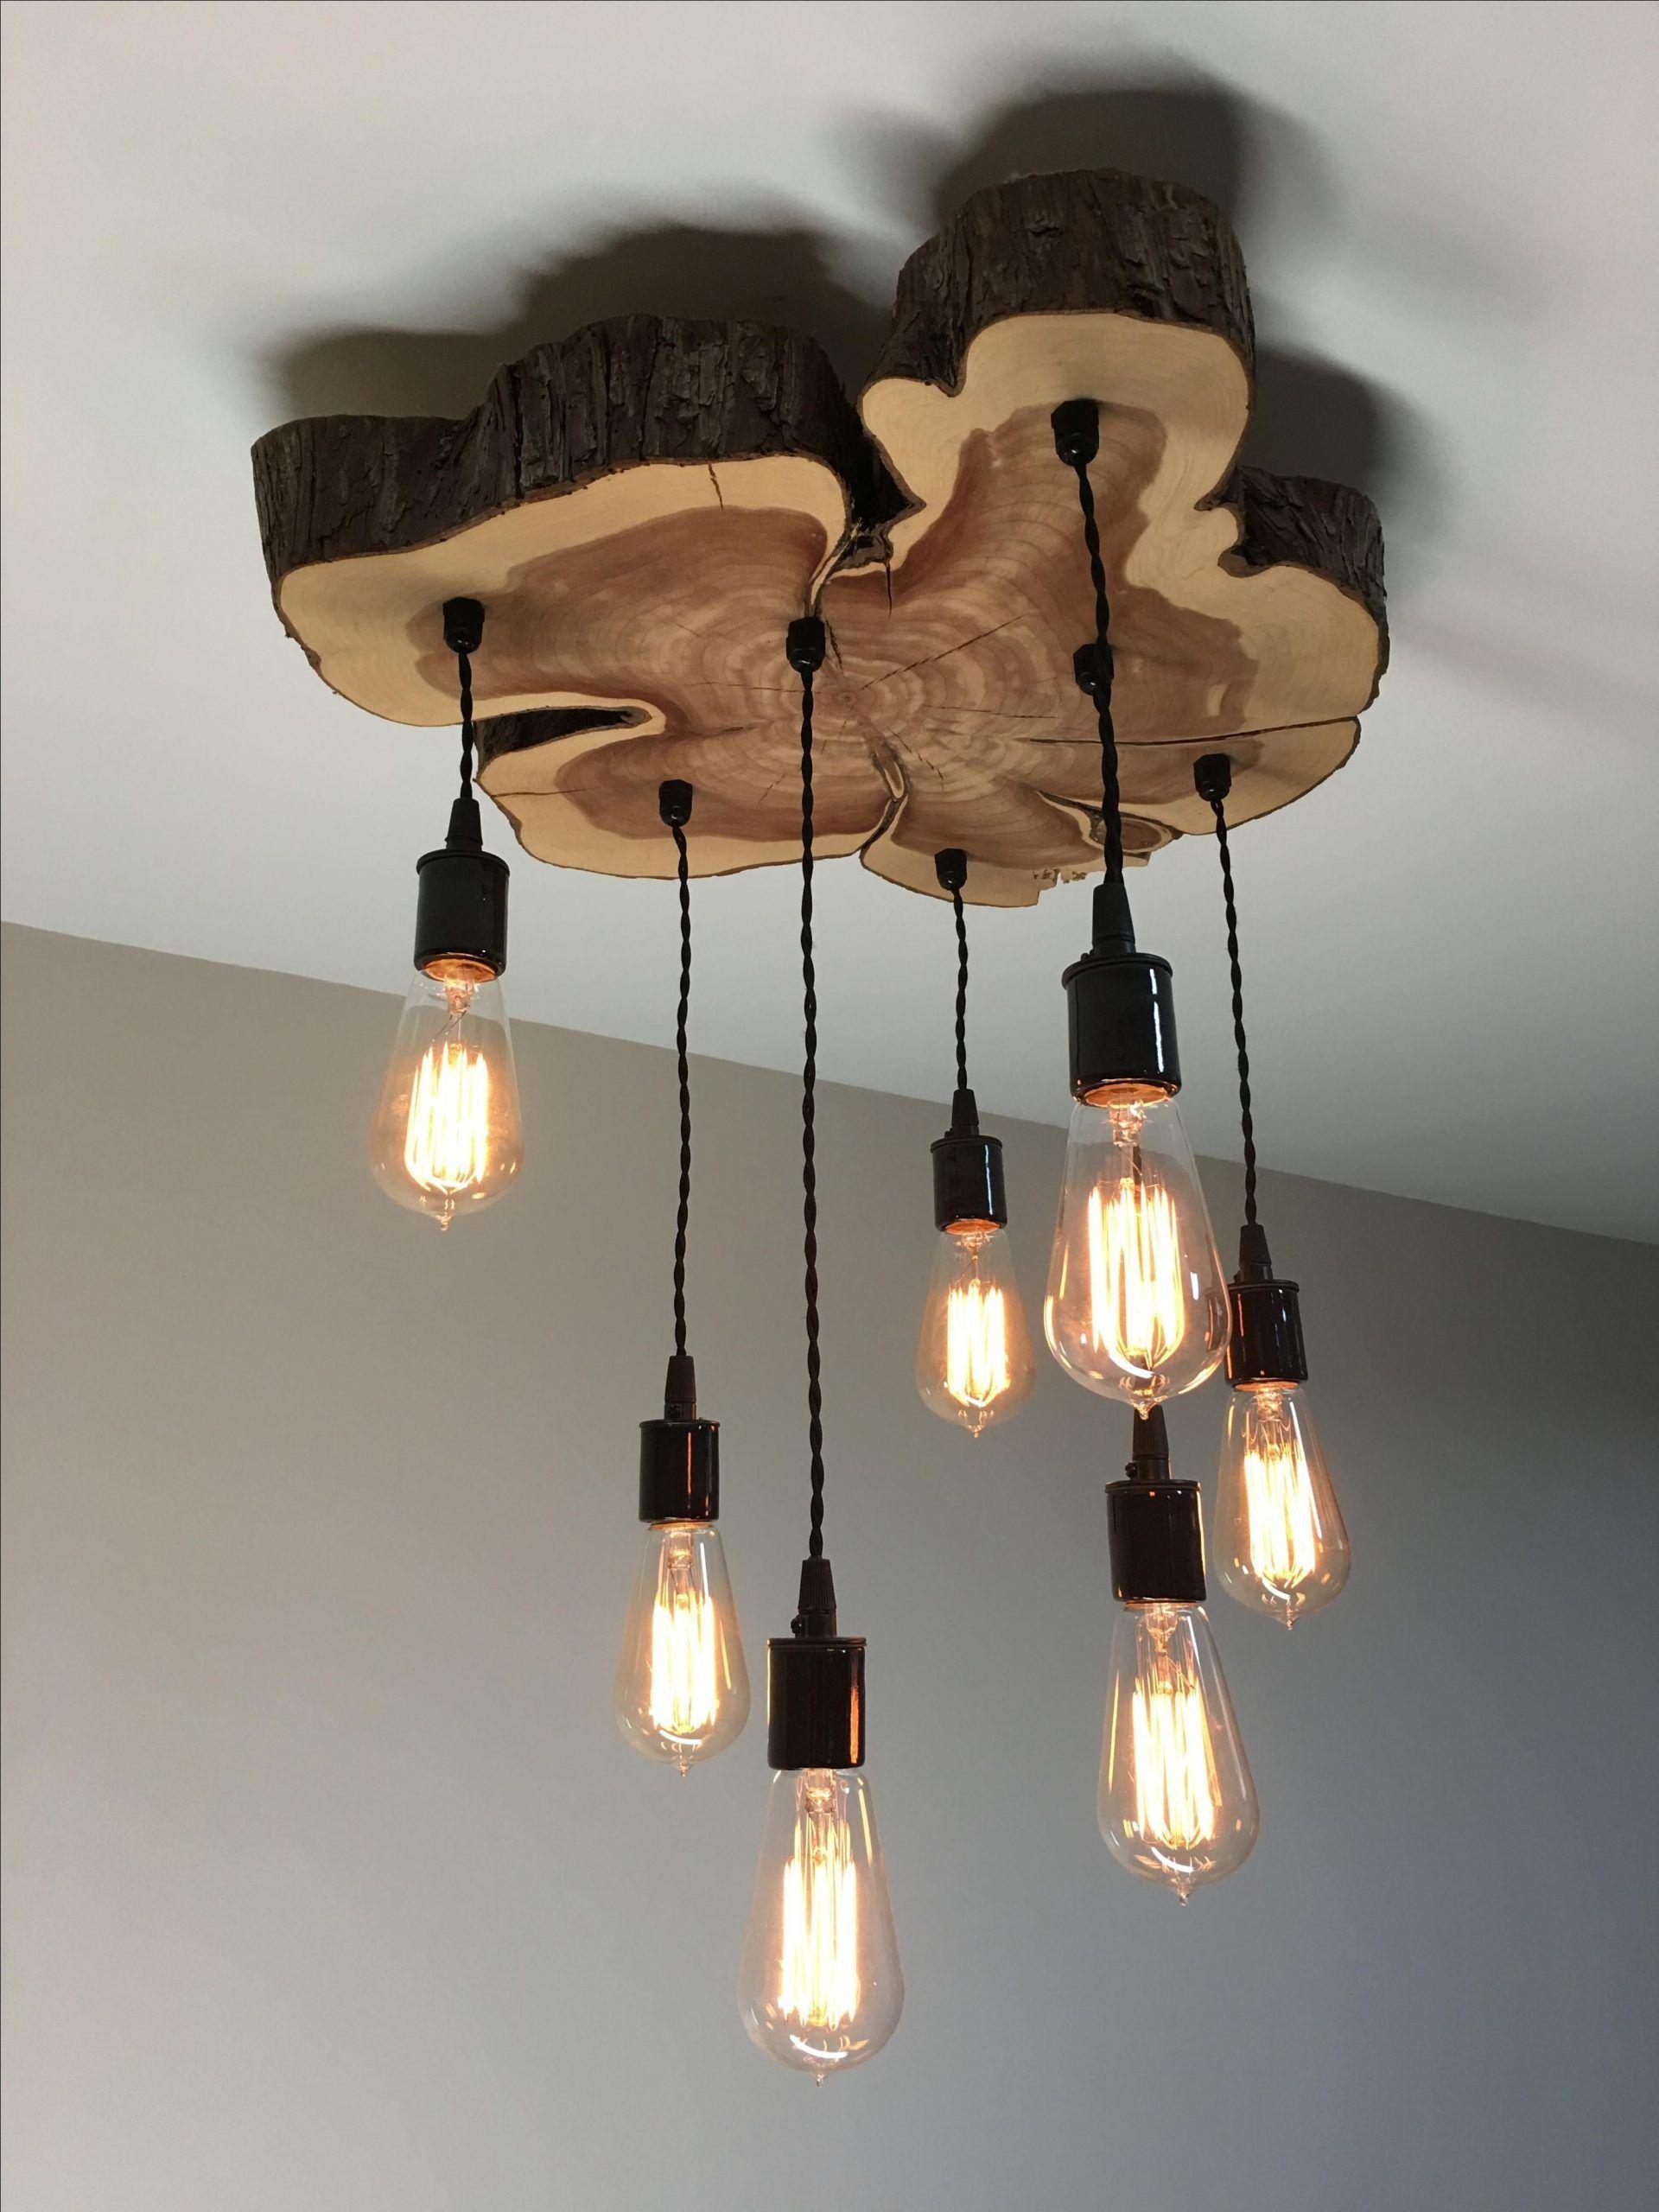 Custom Made Custom Lighting Chandeliers, Pendants. Rustic